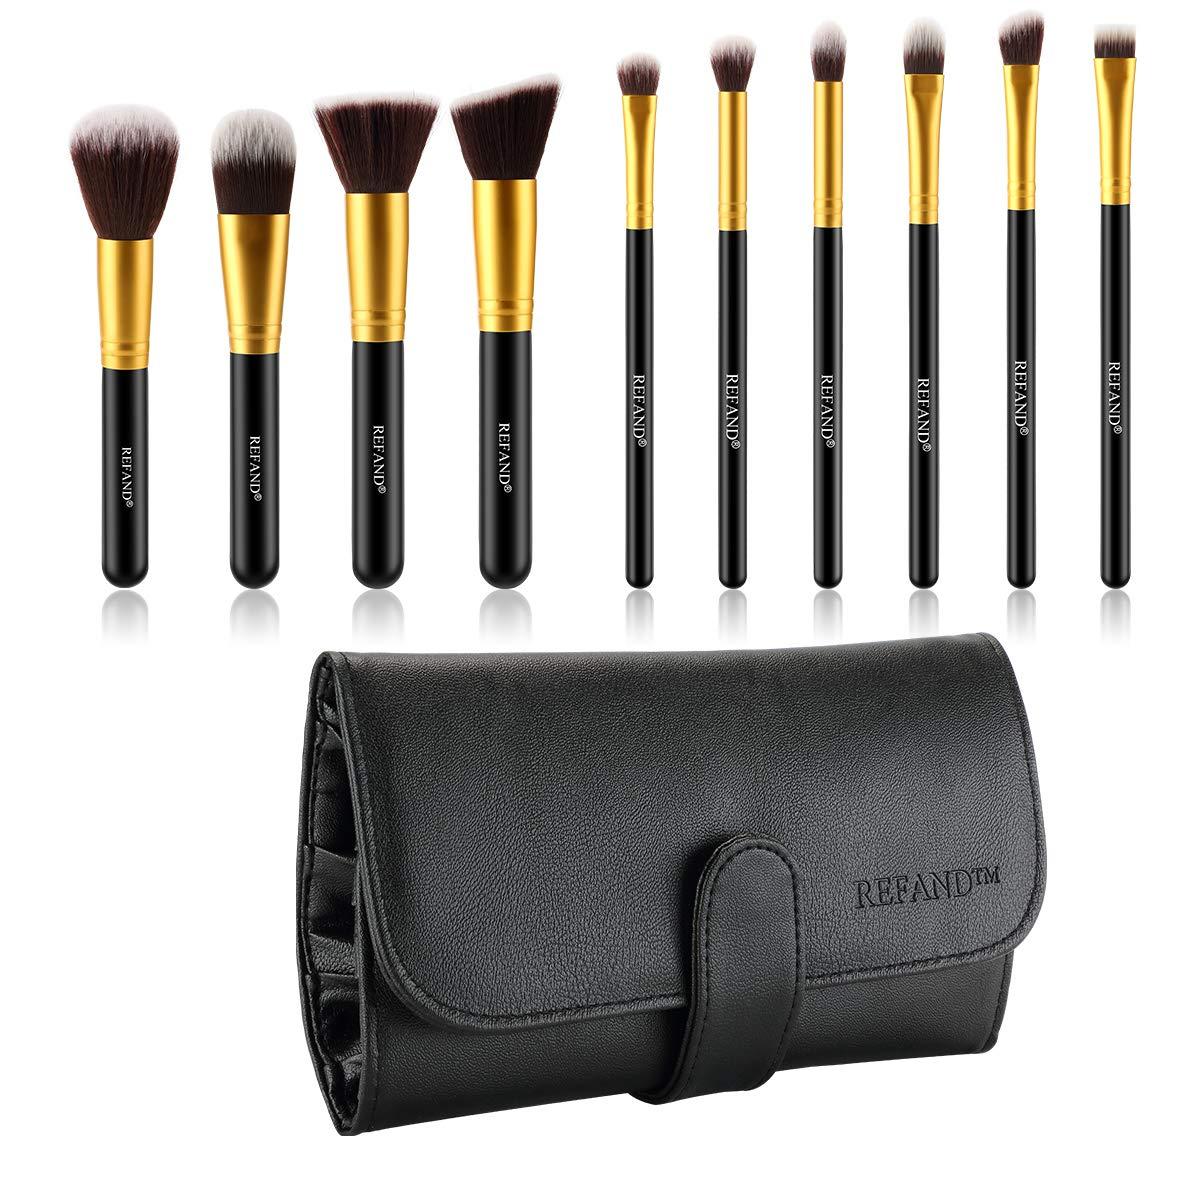 Amazon.com: Refand Makeup Brushes Premium Makeup Brush Set Professional Makeup Kit with Pu Leather Storage Bag Gold Black (10 pcs): Beauty